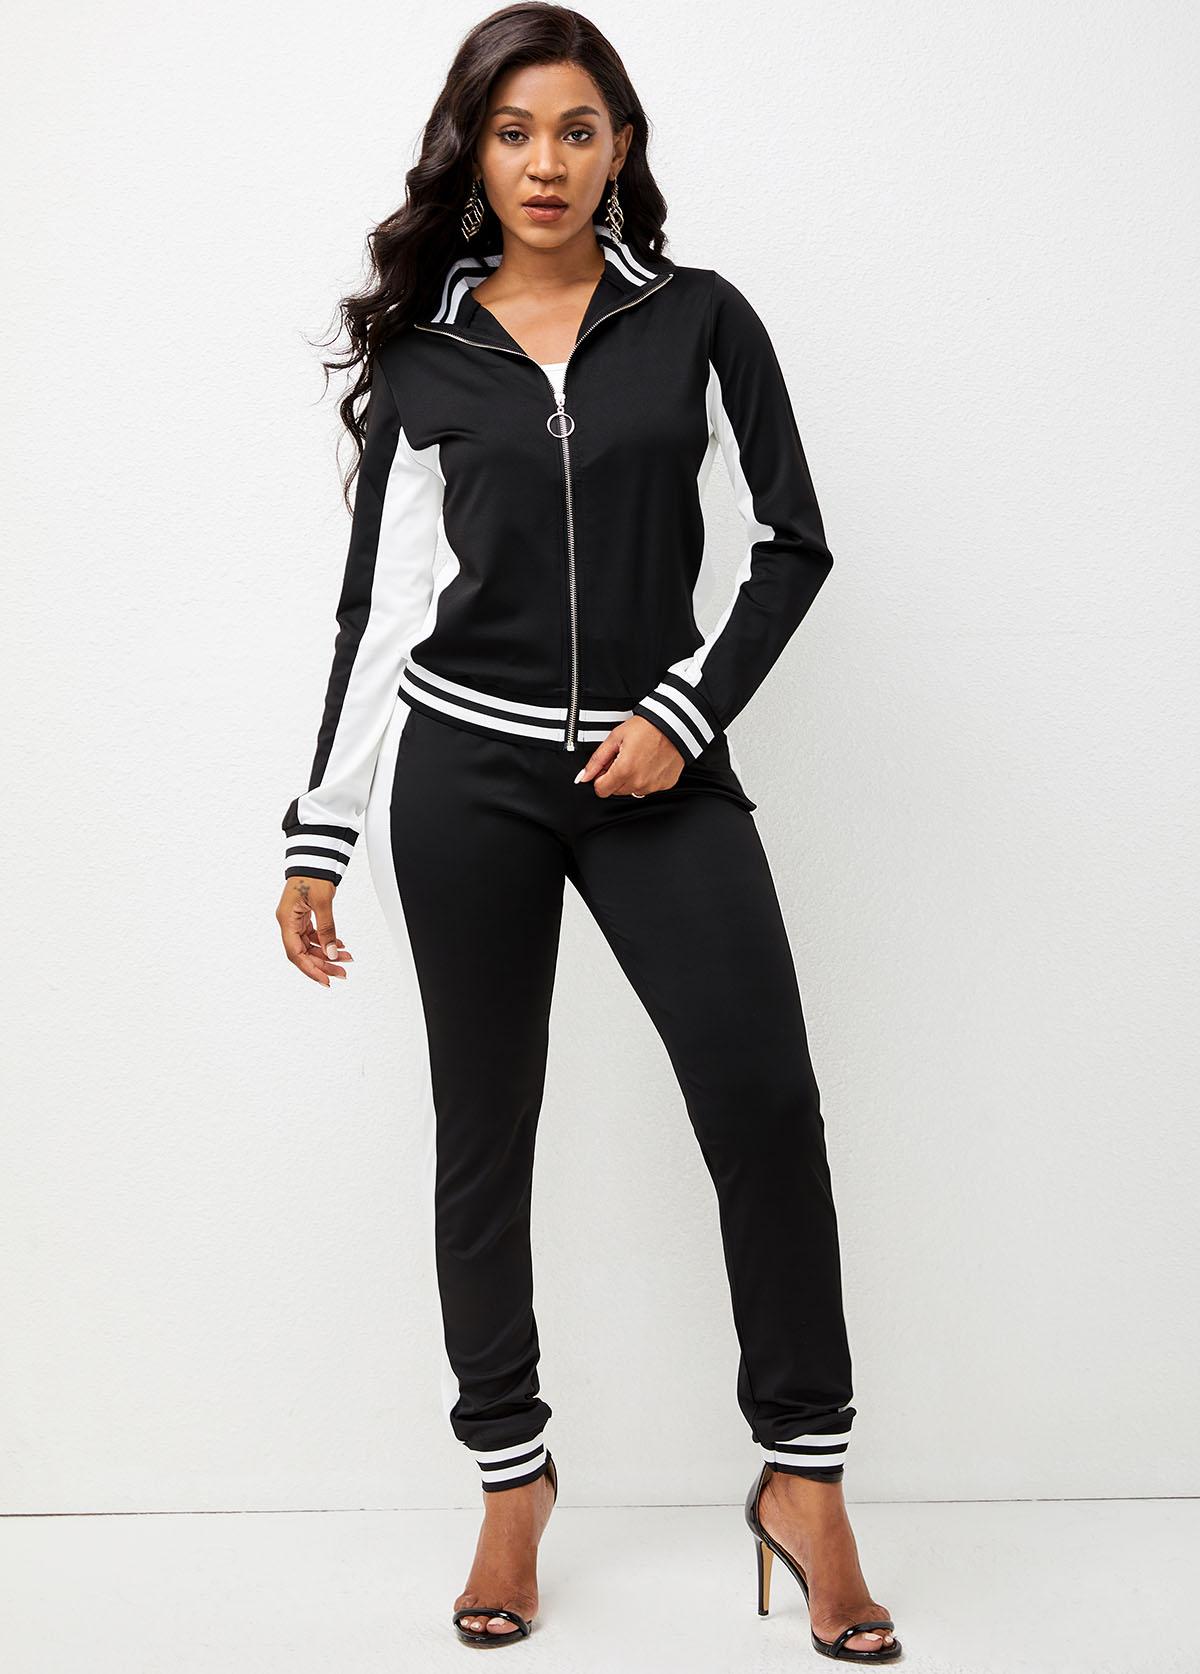 Zipper Closure Long Sleeve Striped Sweatsuit